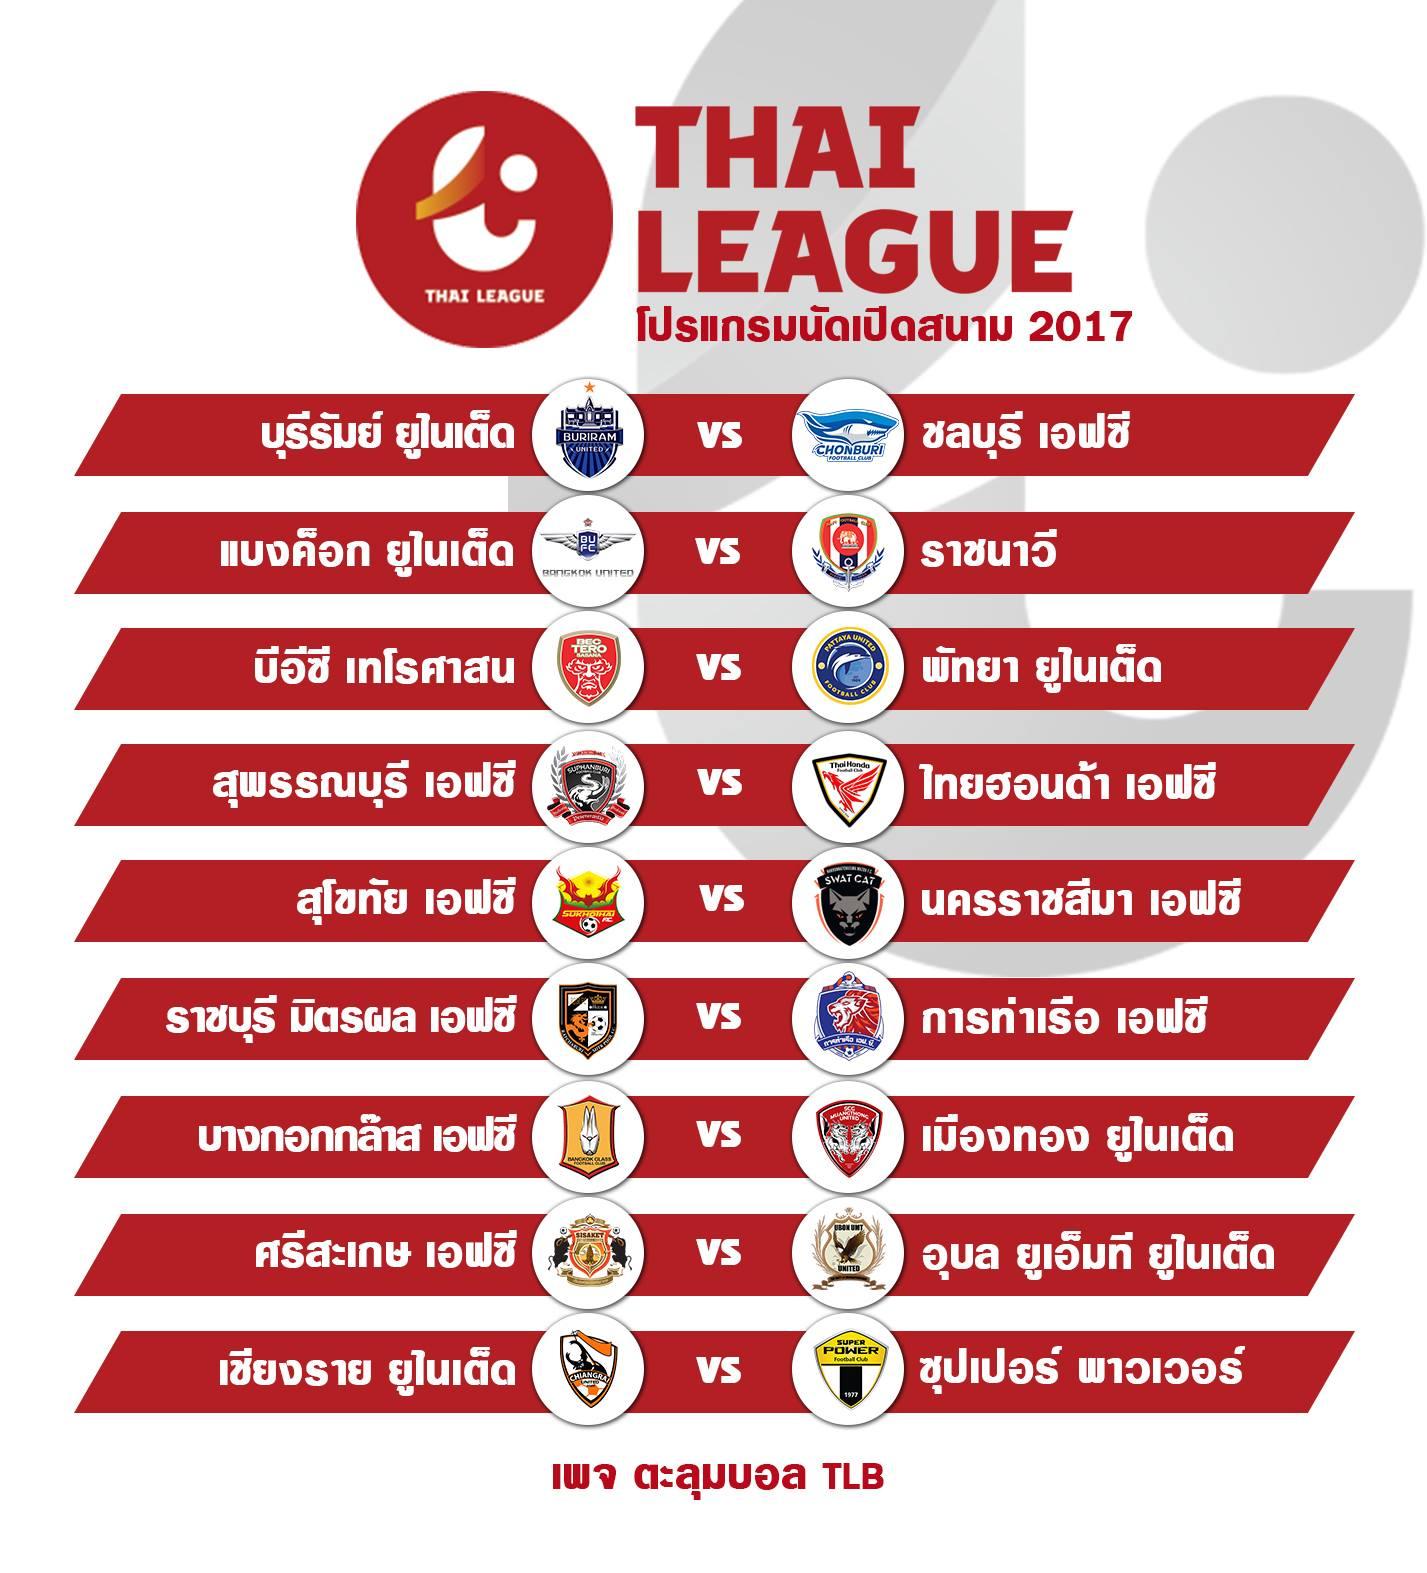 macth-thaileage-2017 by sbobetgroup แทงบอลออนไลน์